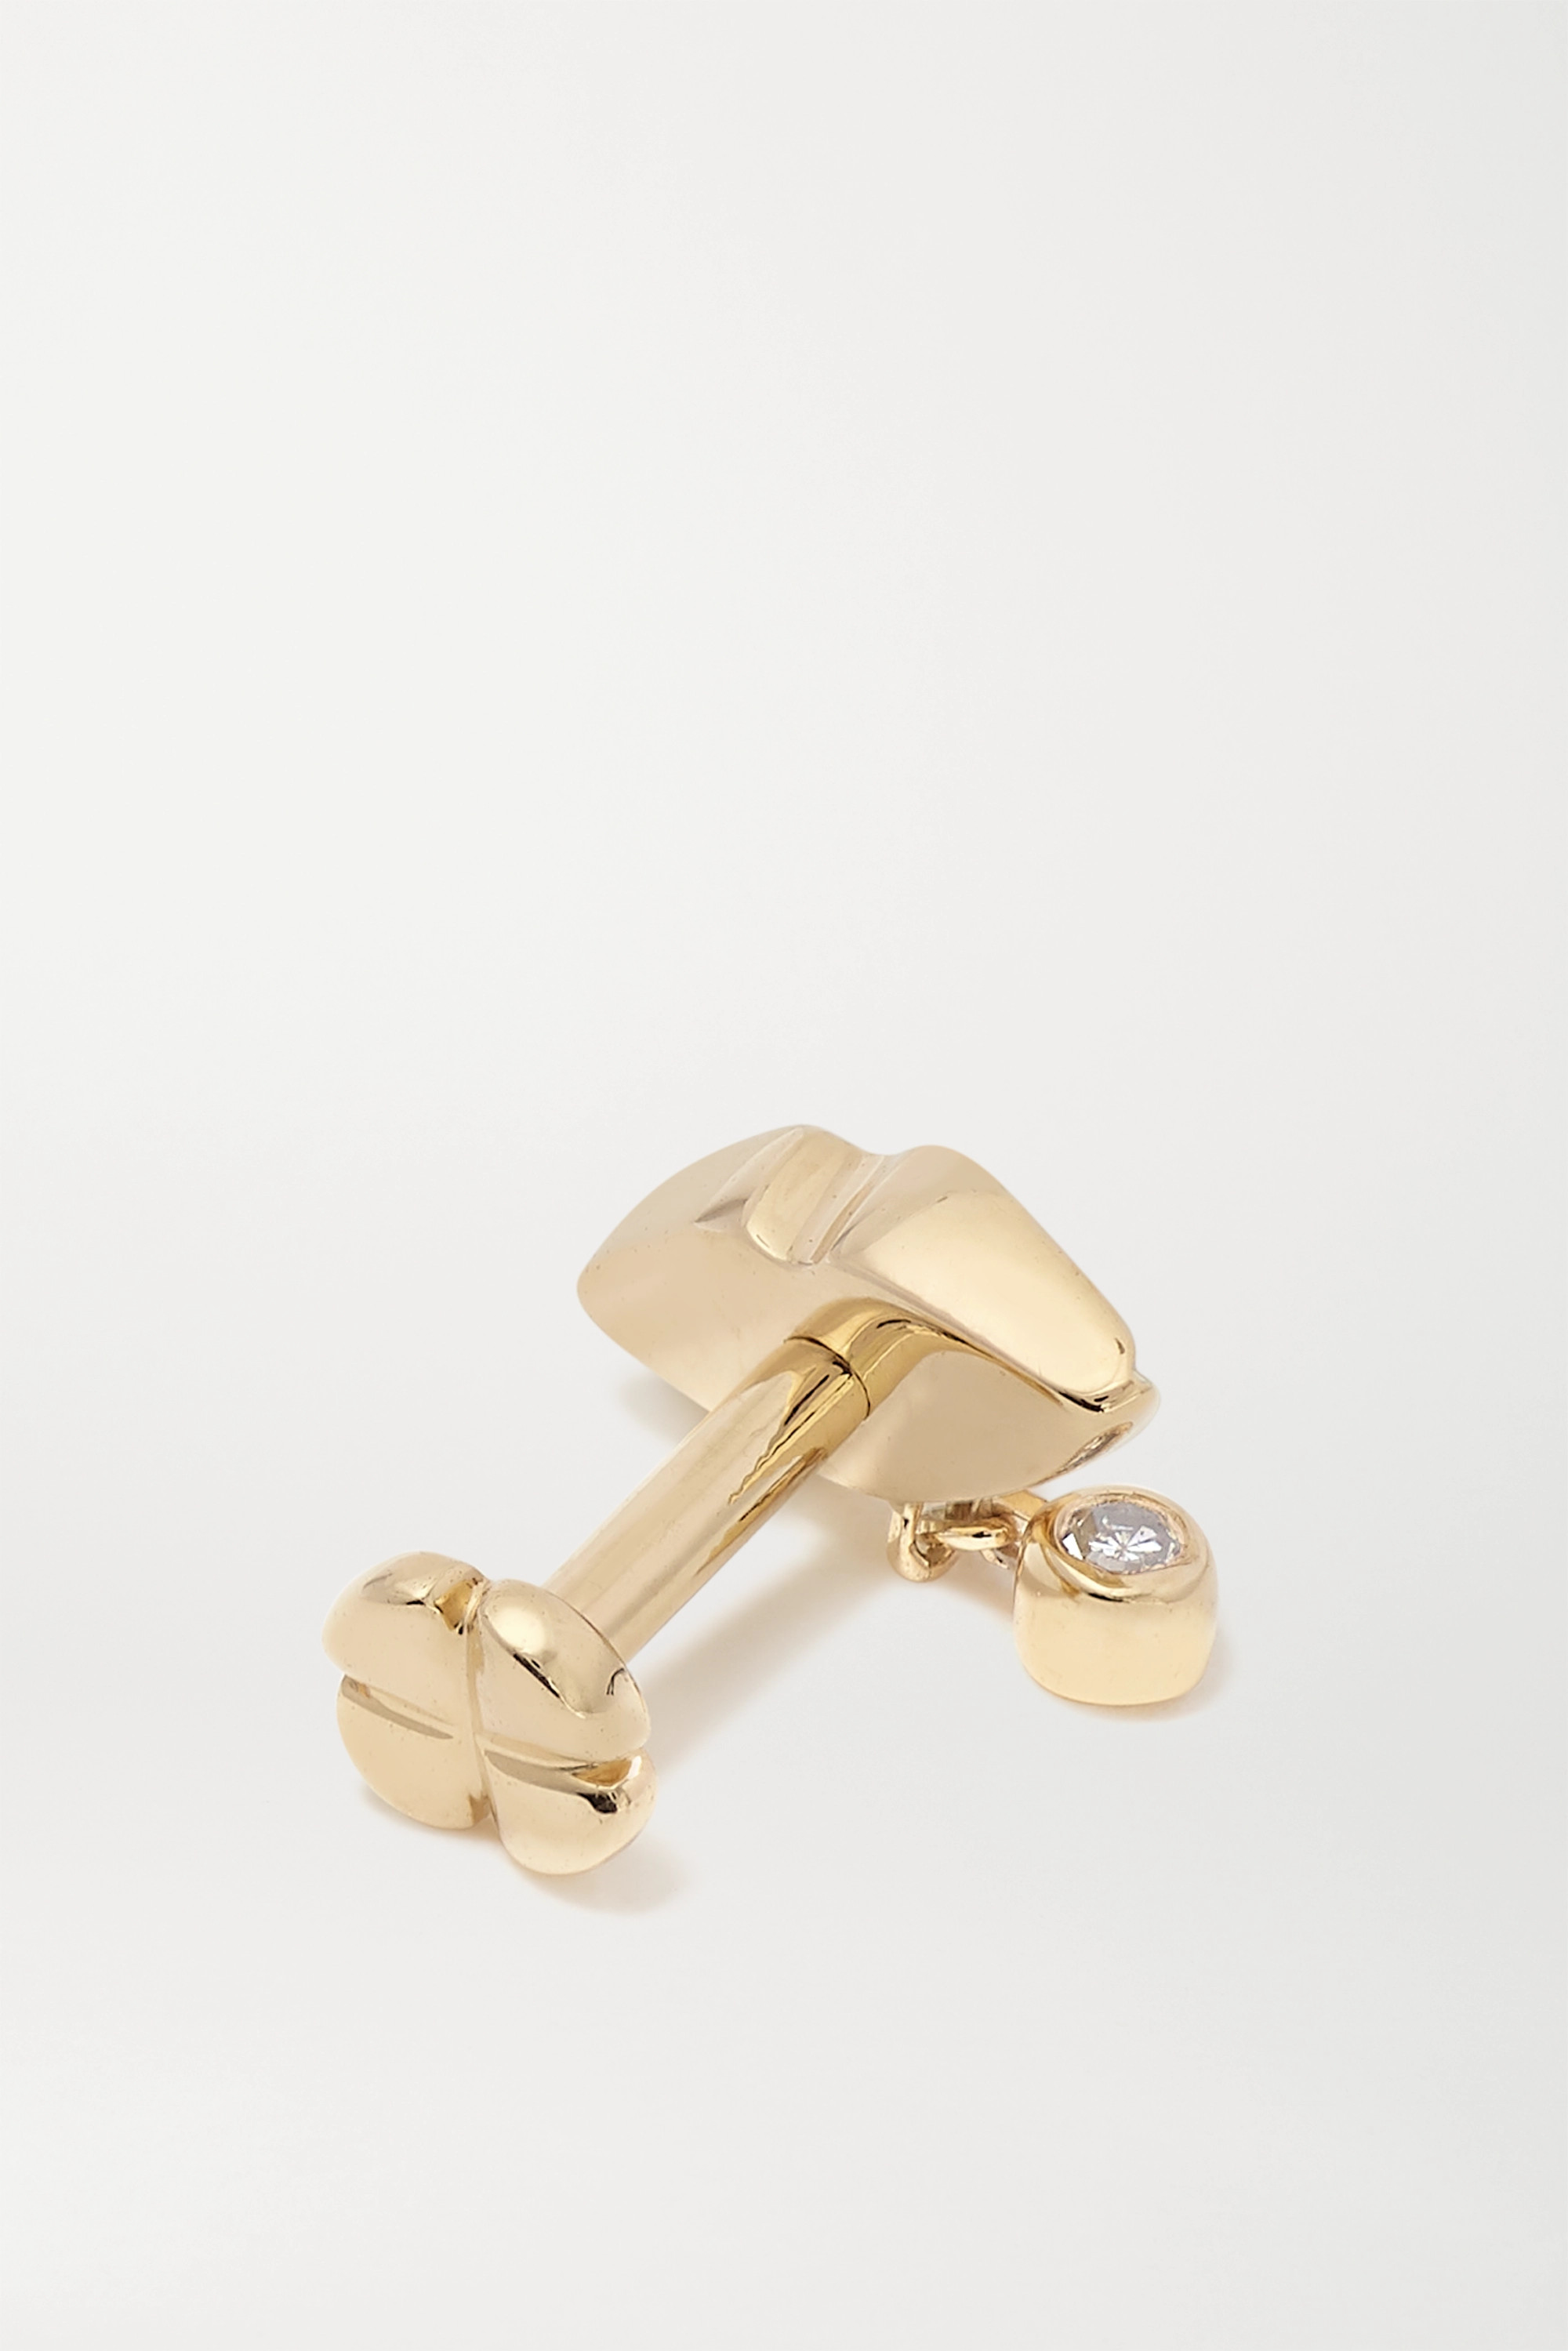 Maria Black Lips Ohrring aus Gold mit Diamant